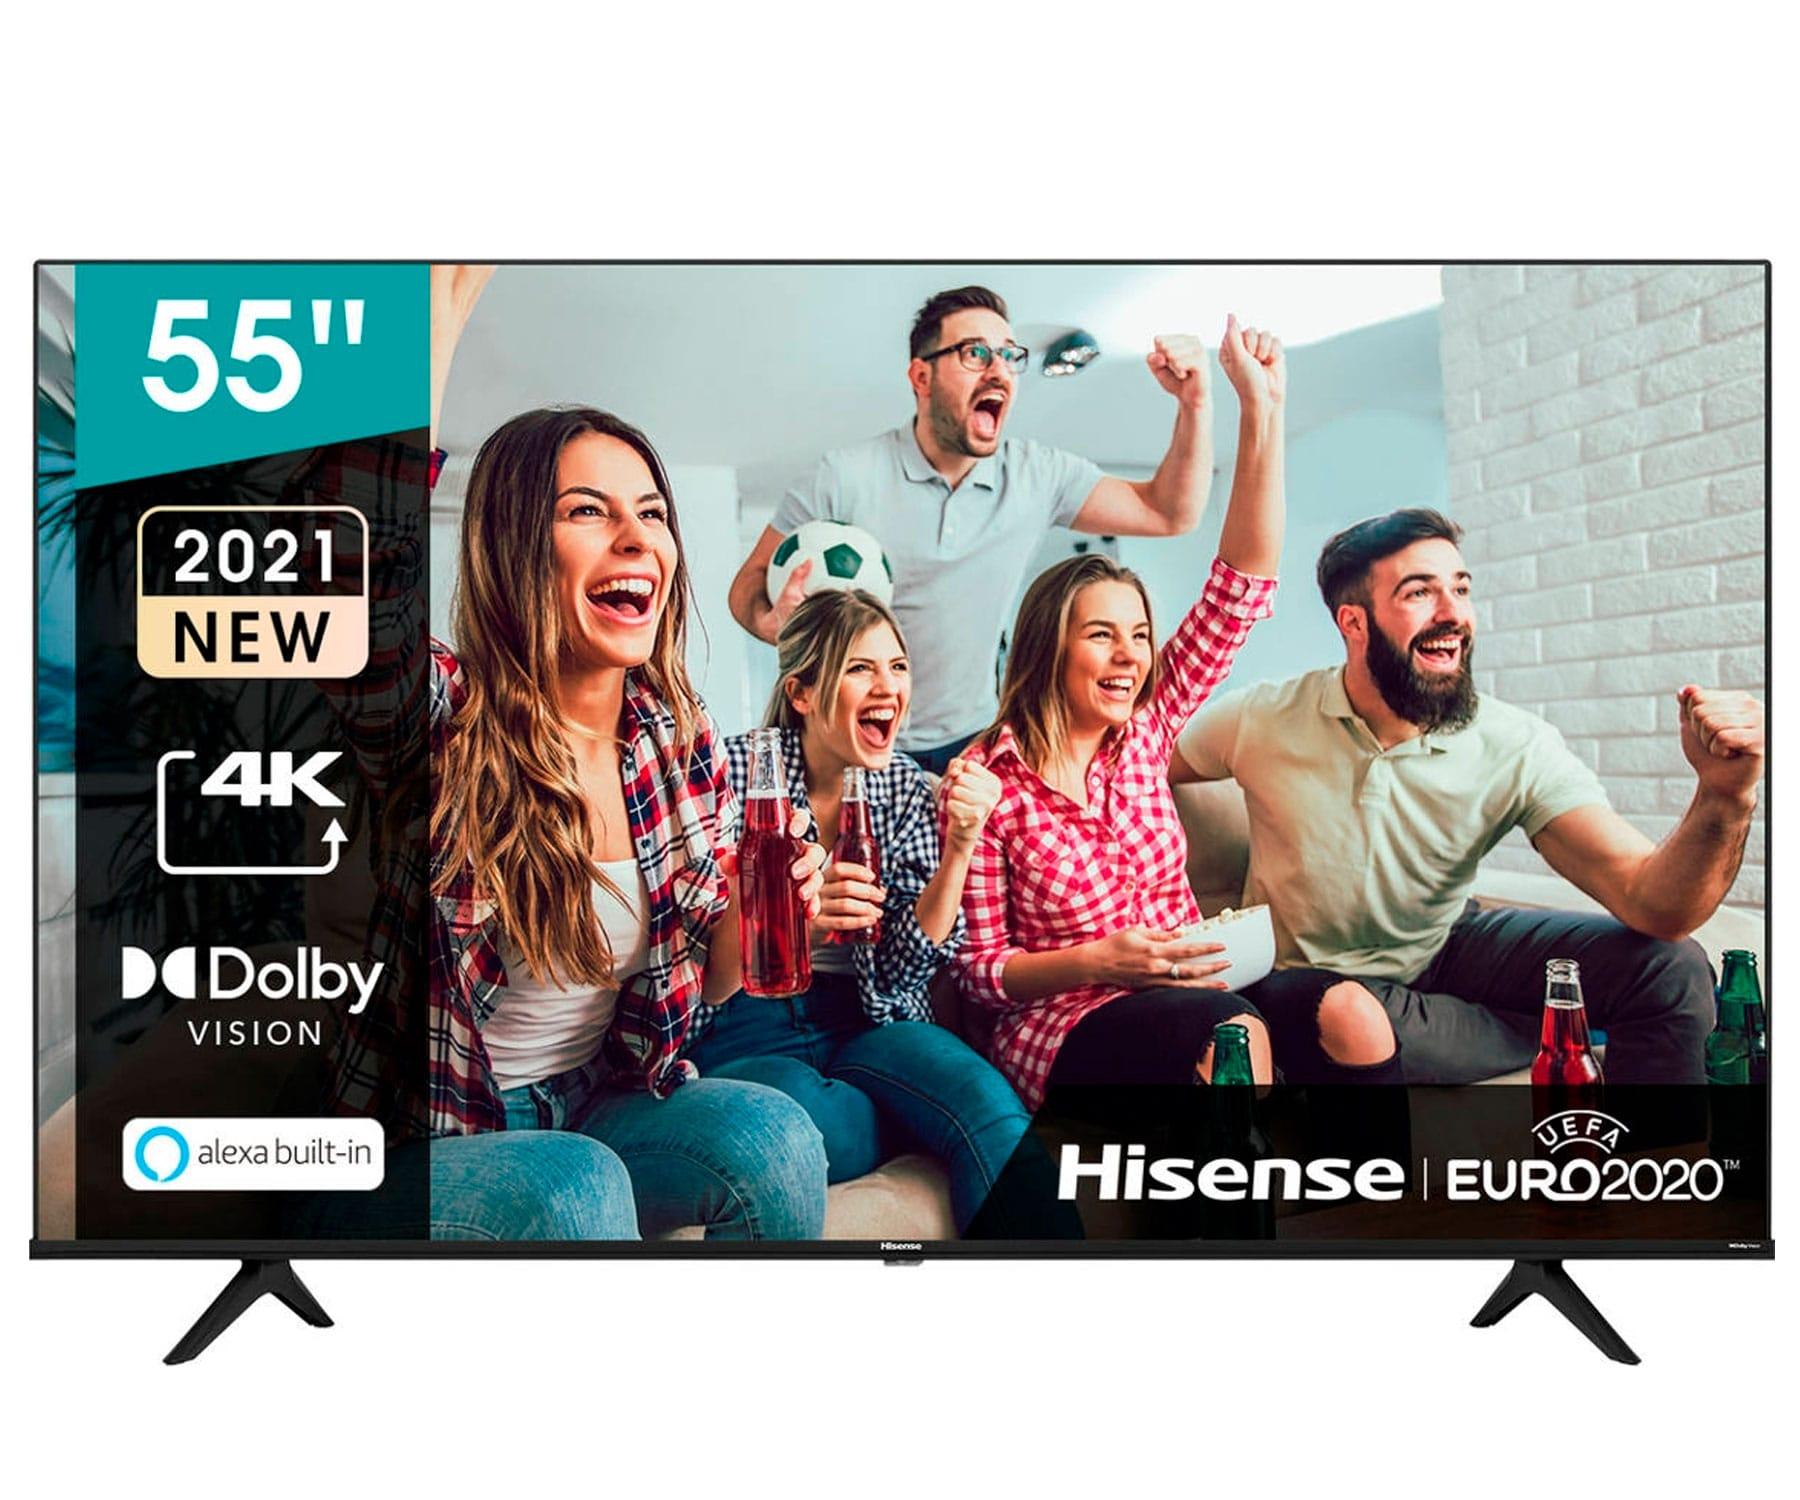 Hisense H55A6G TV 55''/4K UHD/Smart TV/HDR/WiFi/Bluetooth